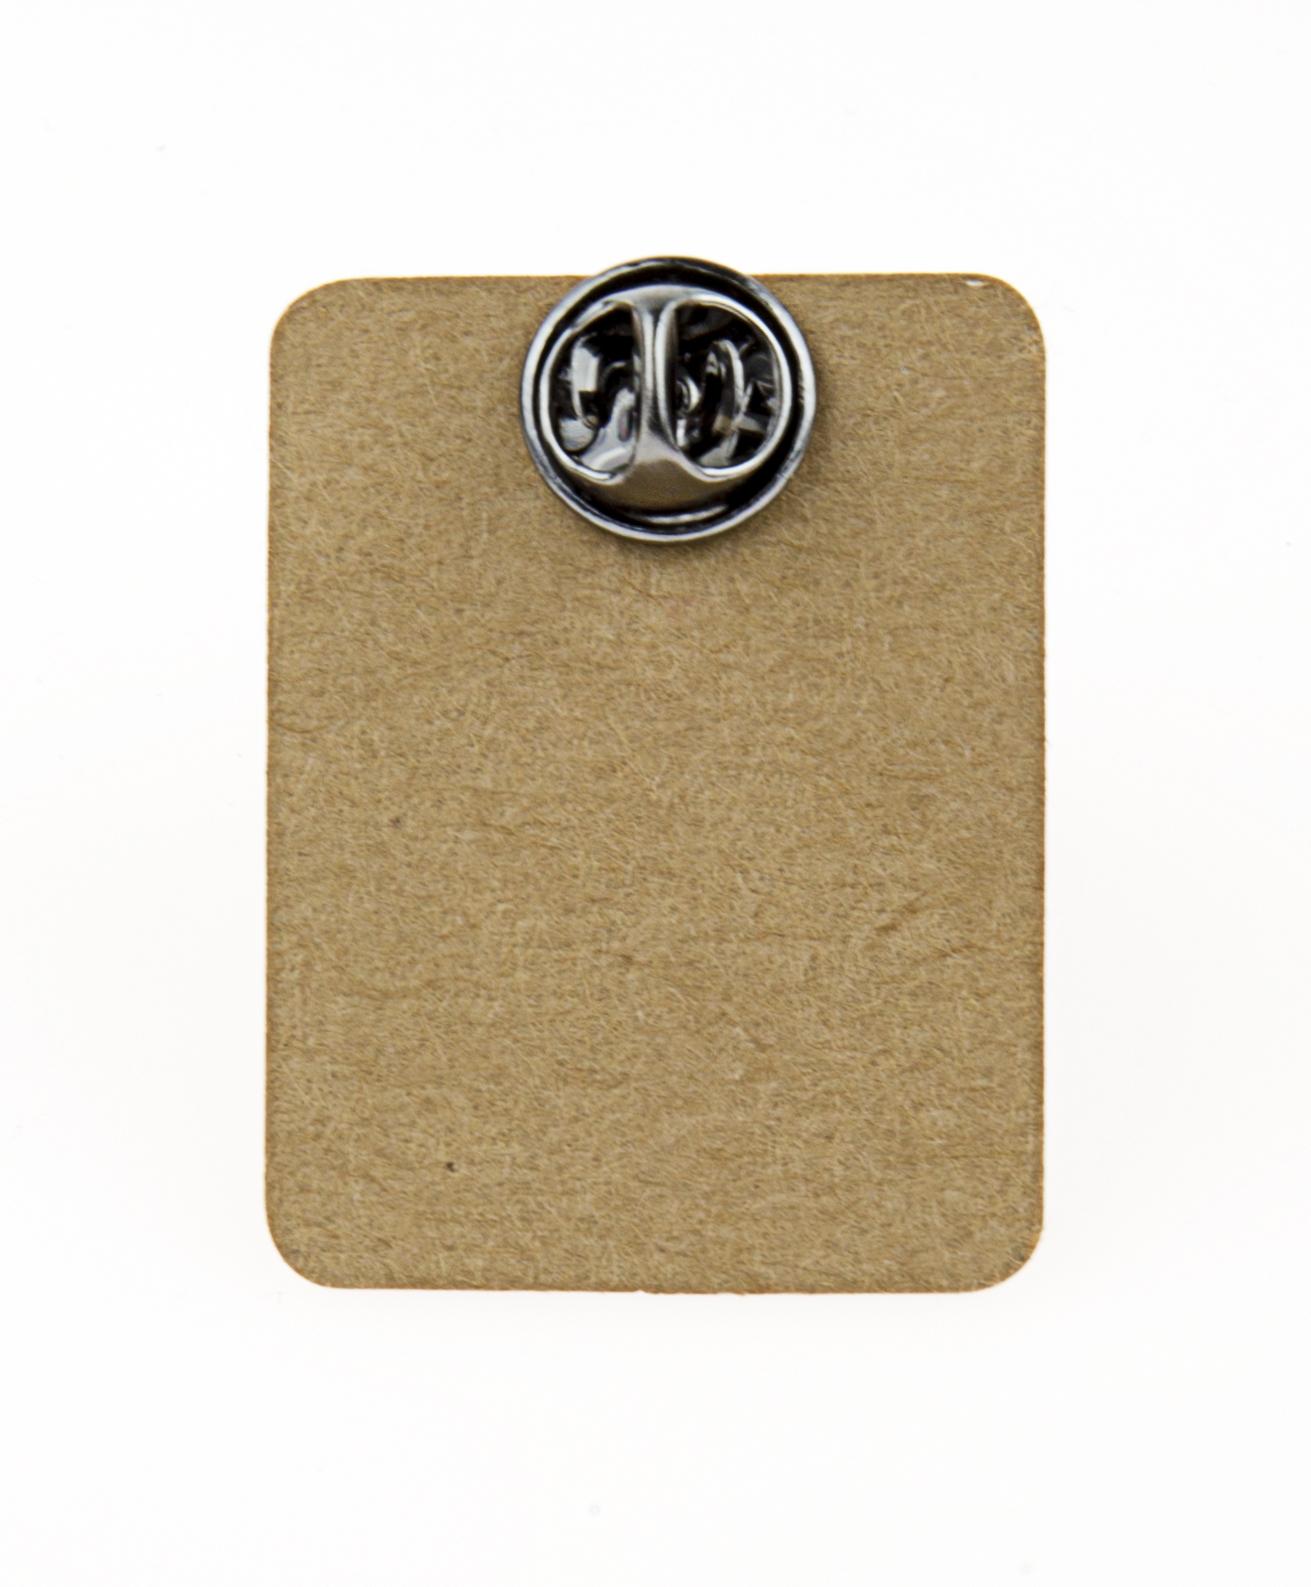 Metal Finger OK Enamel Pin Badge